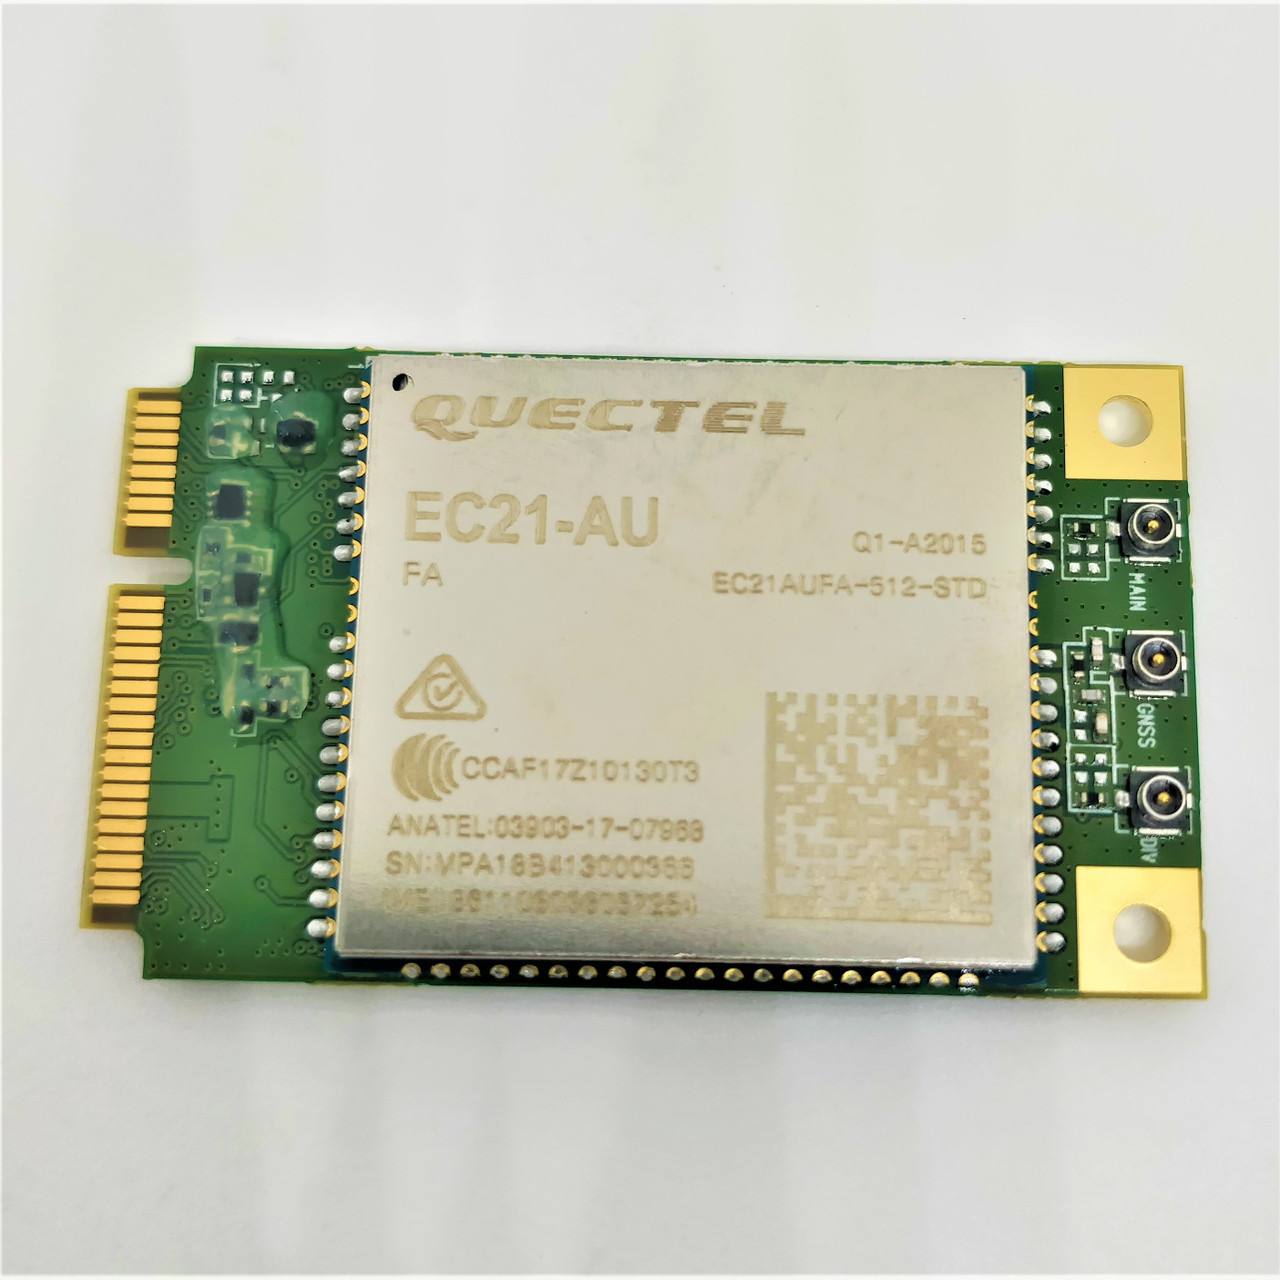 Quectel EC21-AU LTE Mini PCIe Module